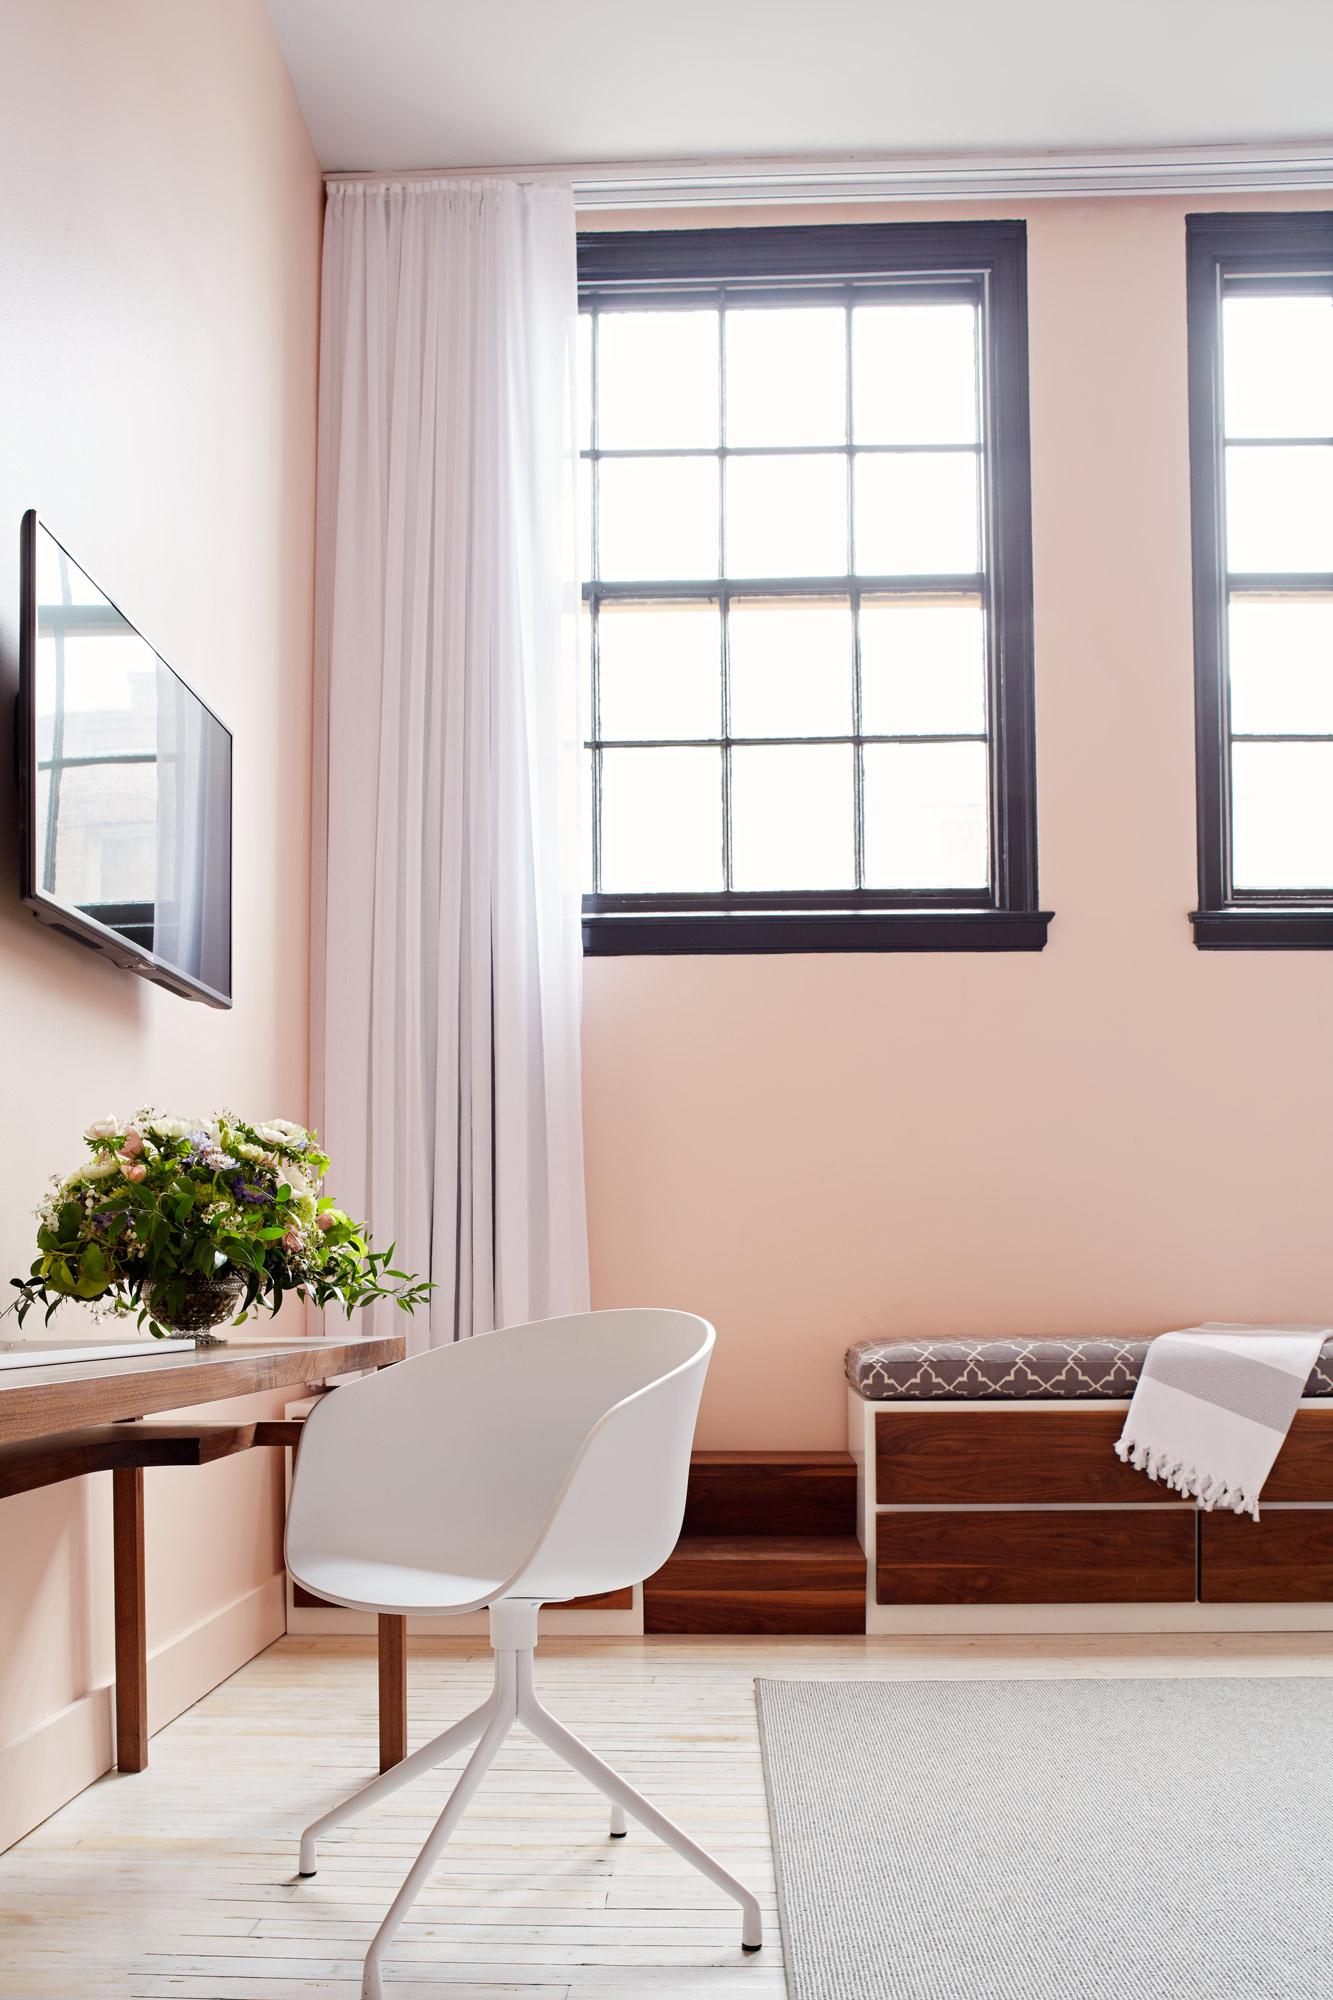 Model room with window (1).jpeg.jpg